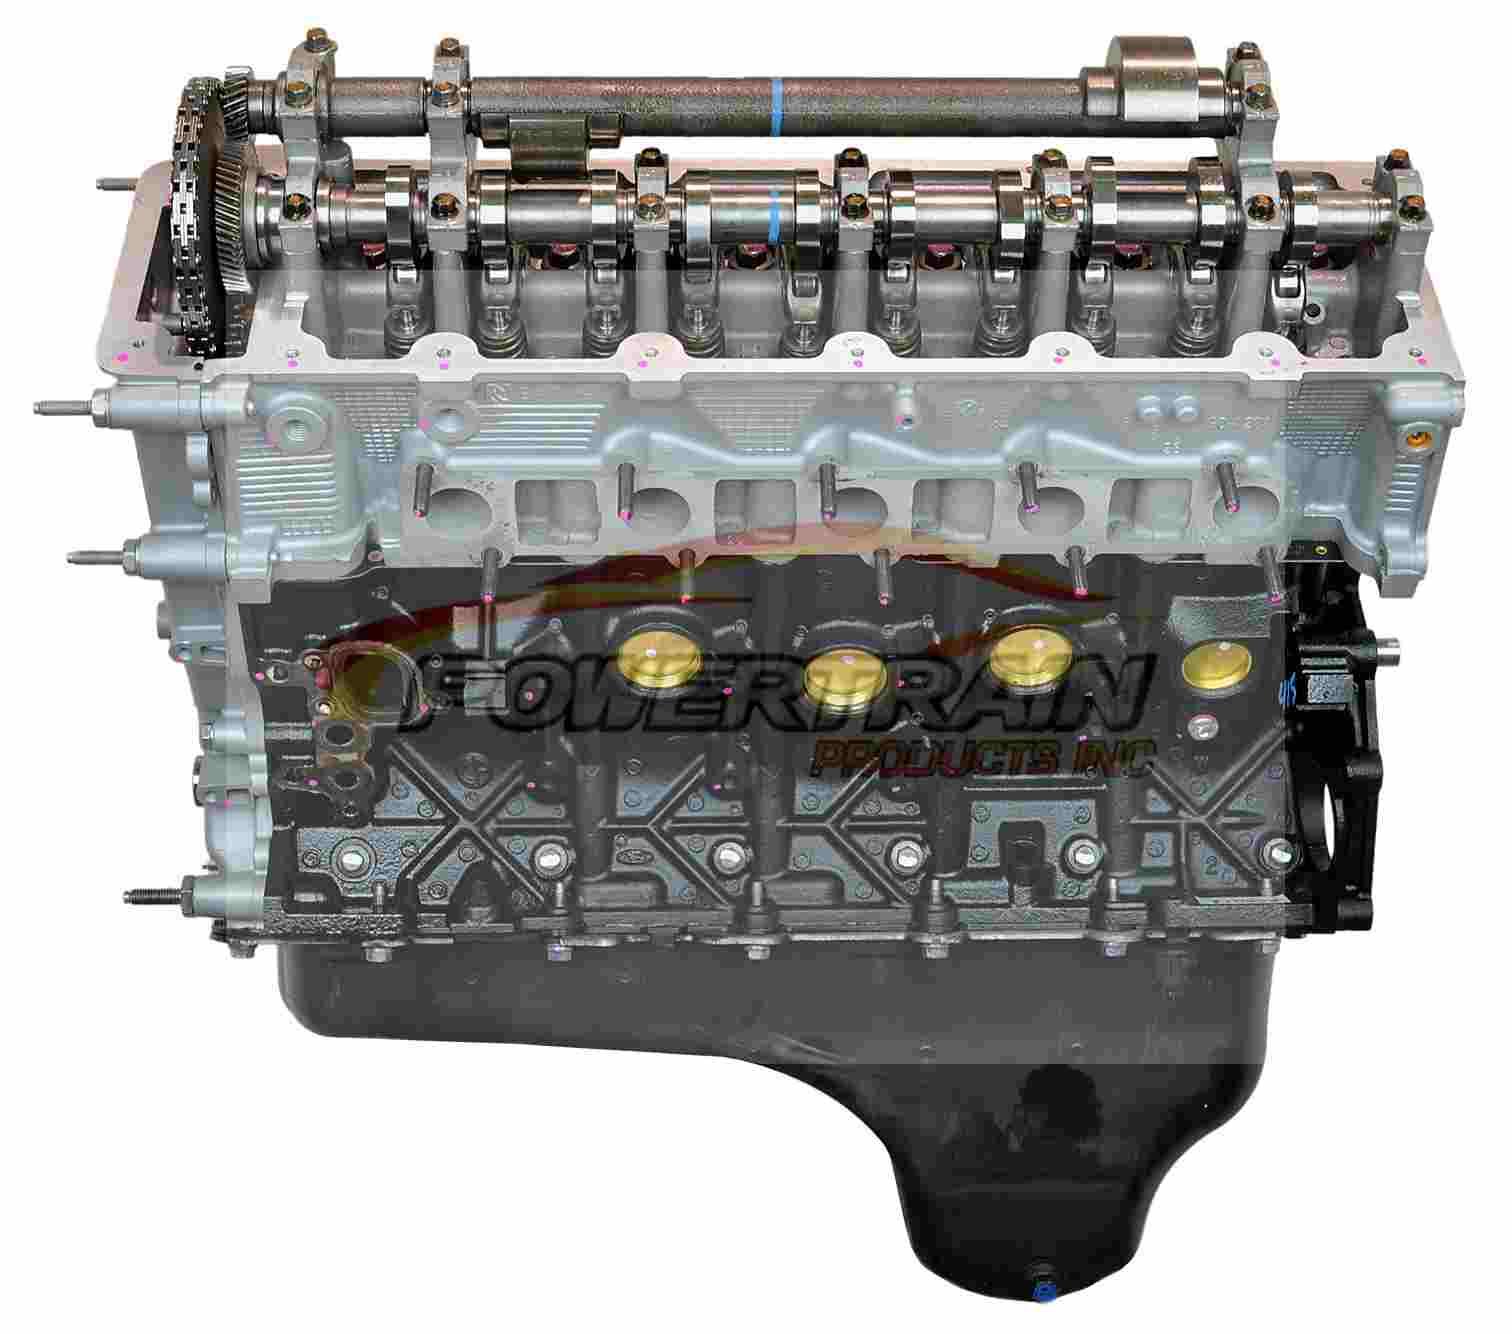 Ford V10 Engine >> Ford 6 8 V10 Engine 2002 2003 Vin S F350 E350